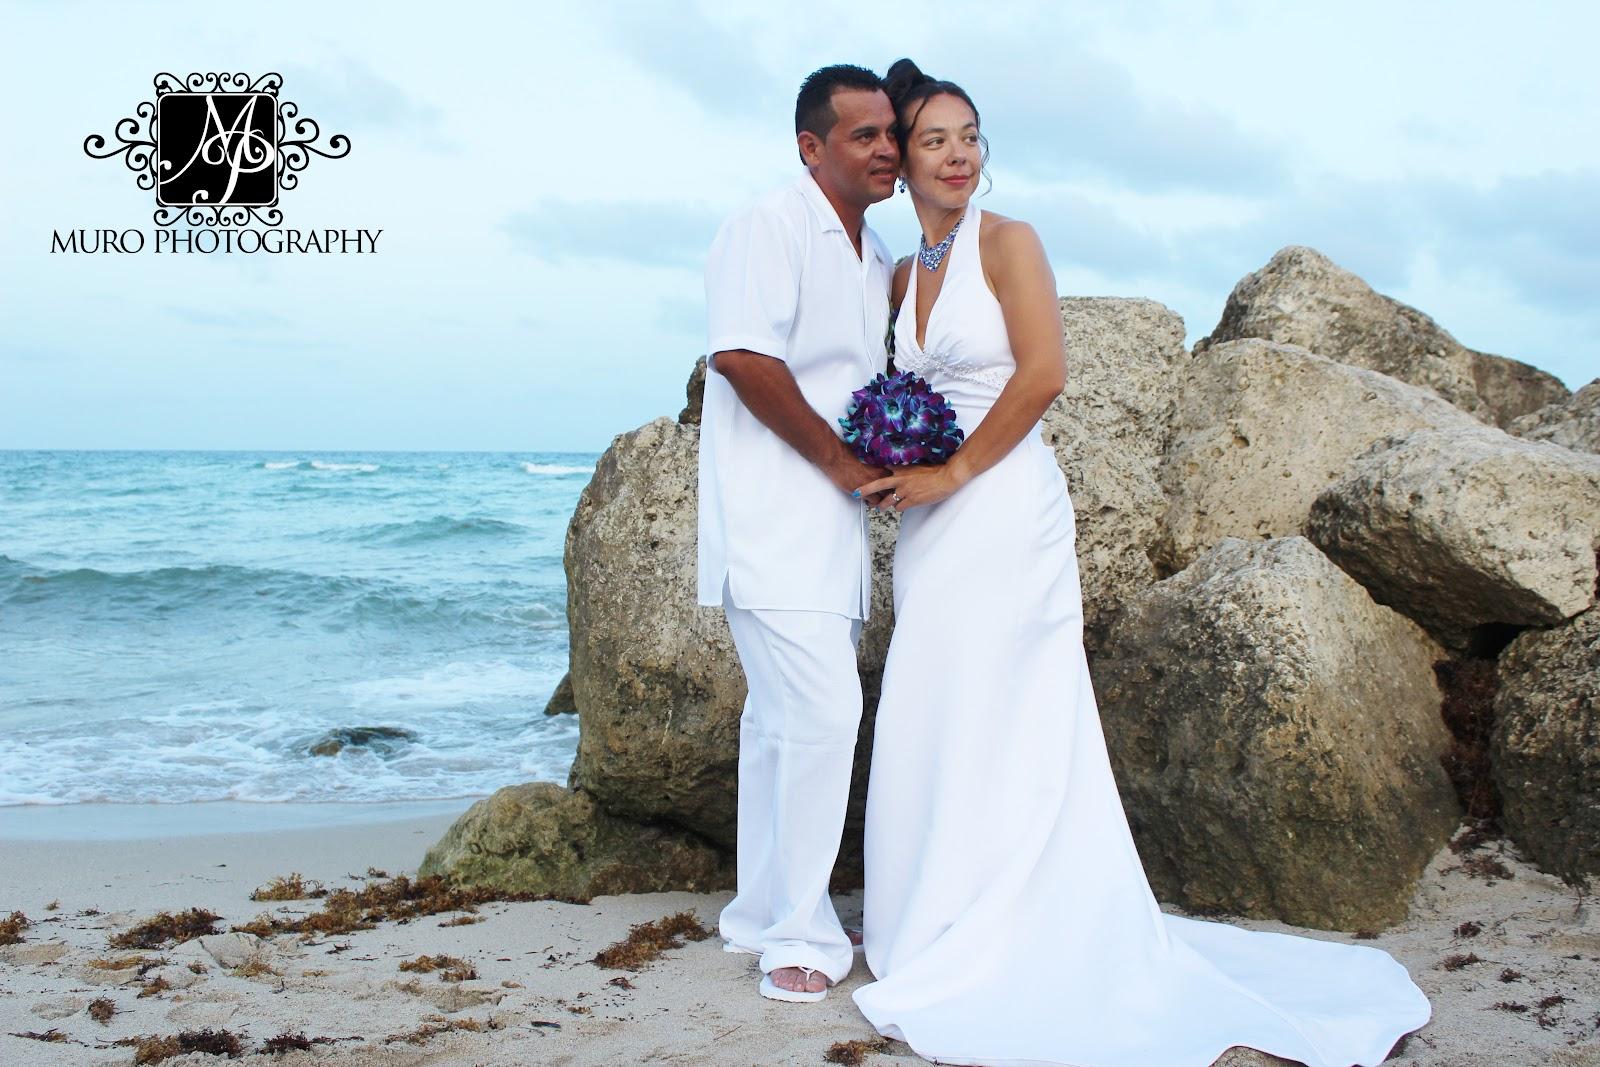 Affordable Beach Weddings! 305-793-4387: Suyapa & Gerardo